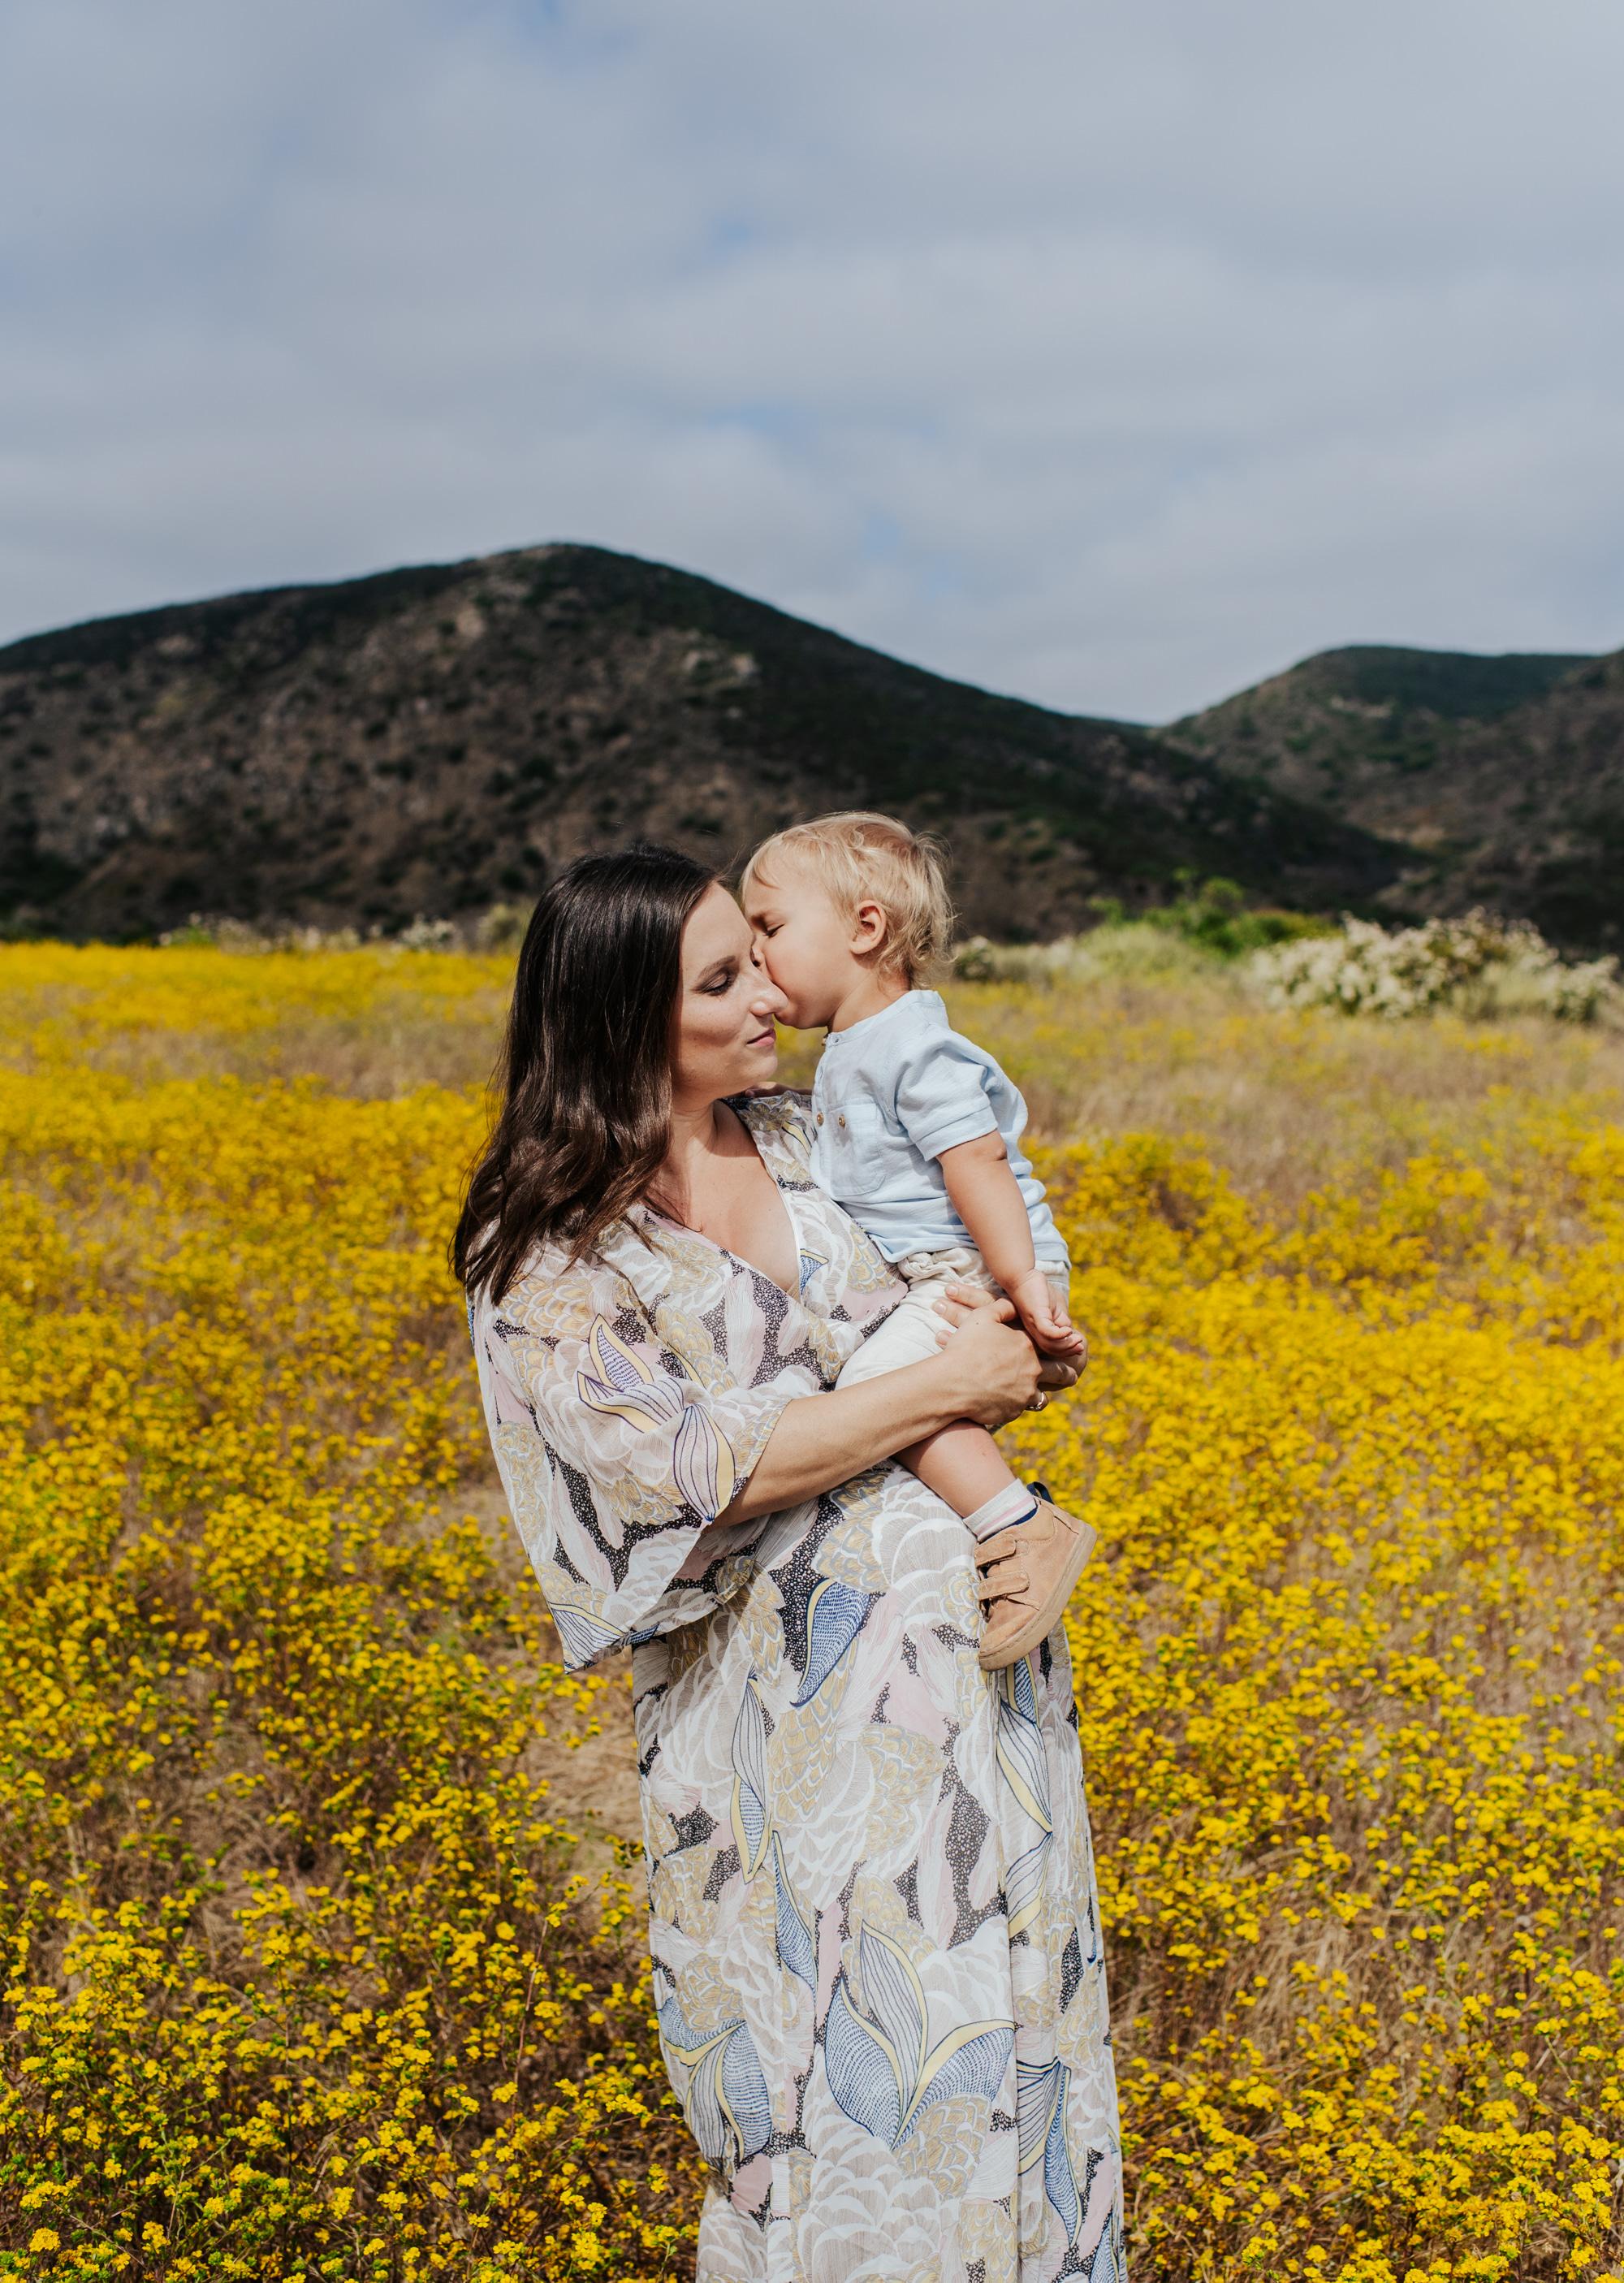 SamErica Studios - The SoCal Standard - San Diego Family photographer - Mission Trails Maternity Session-26.jpg